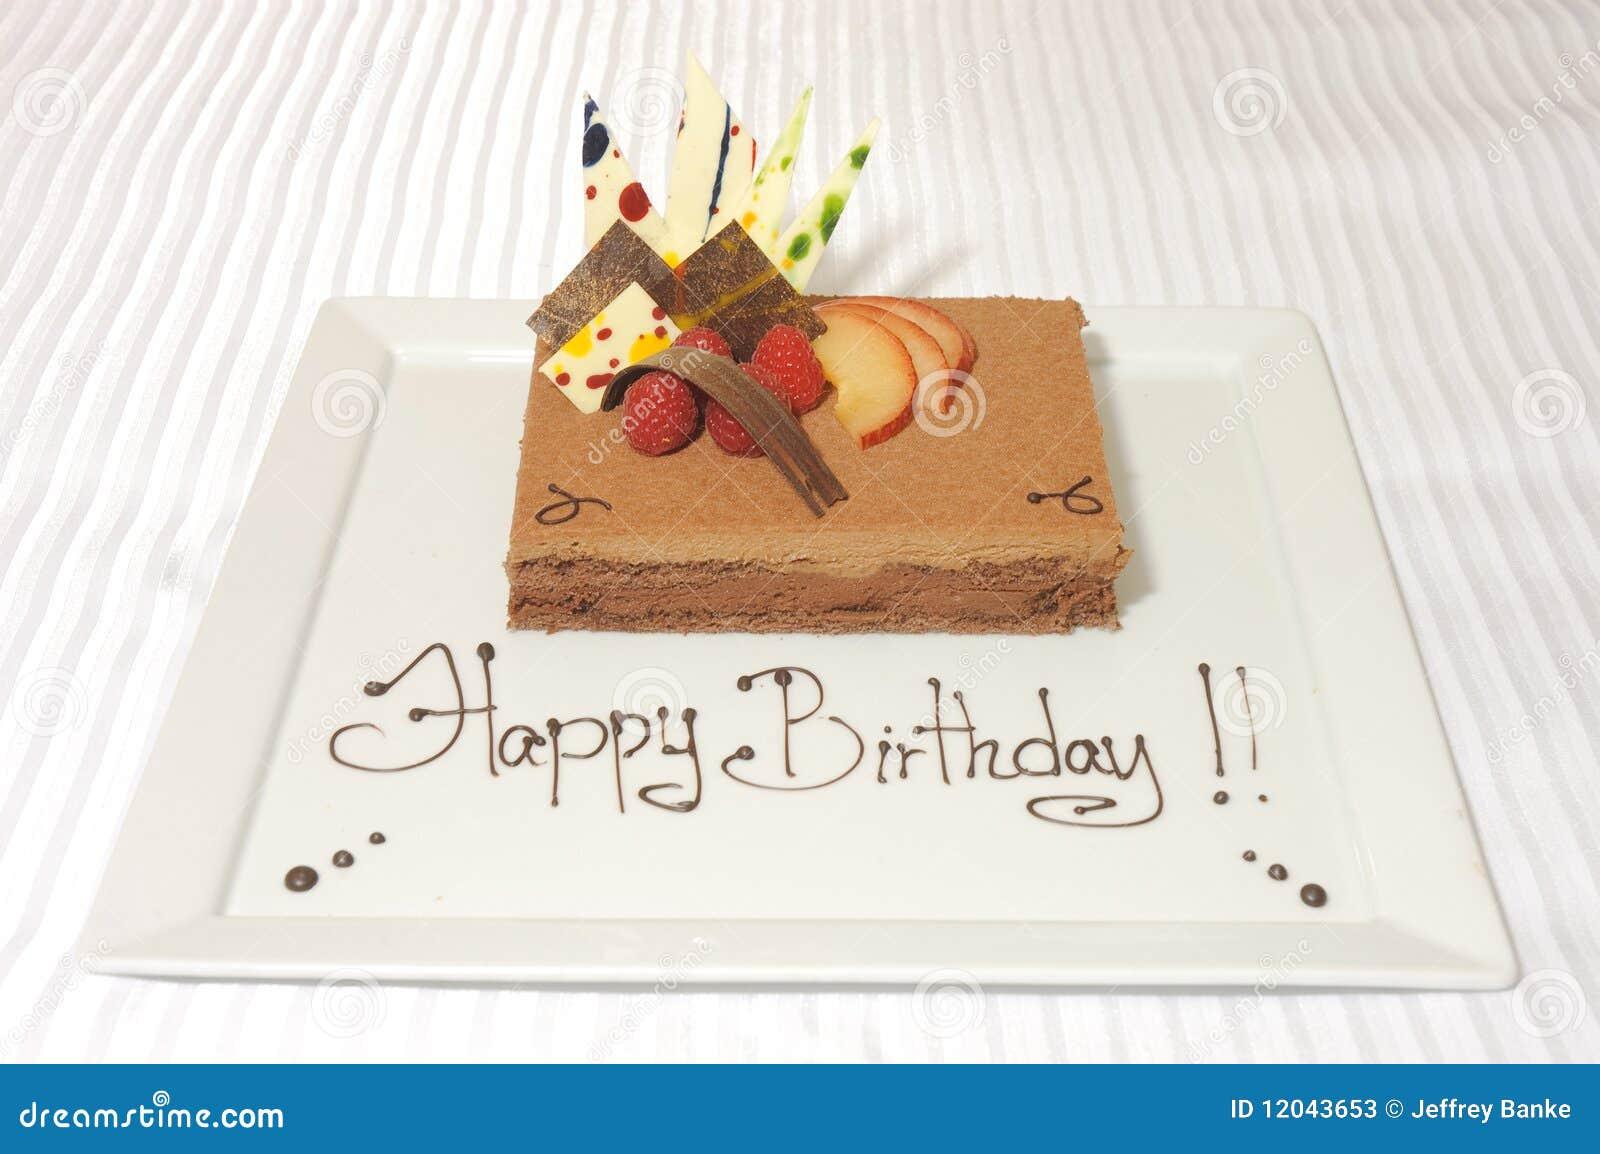 Birthday cake mousse